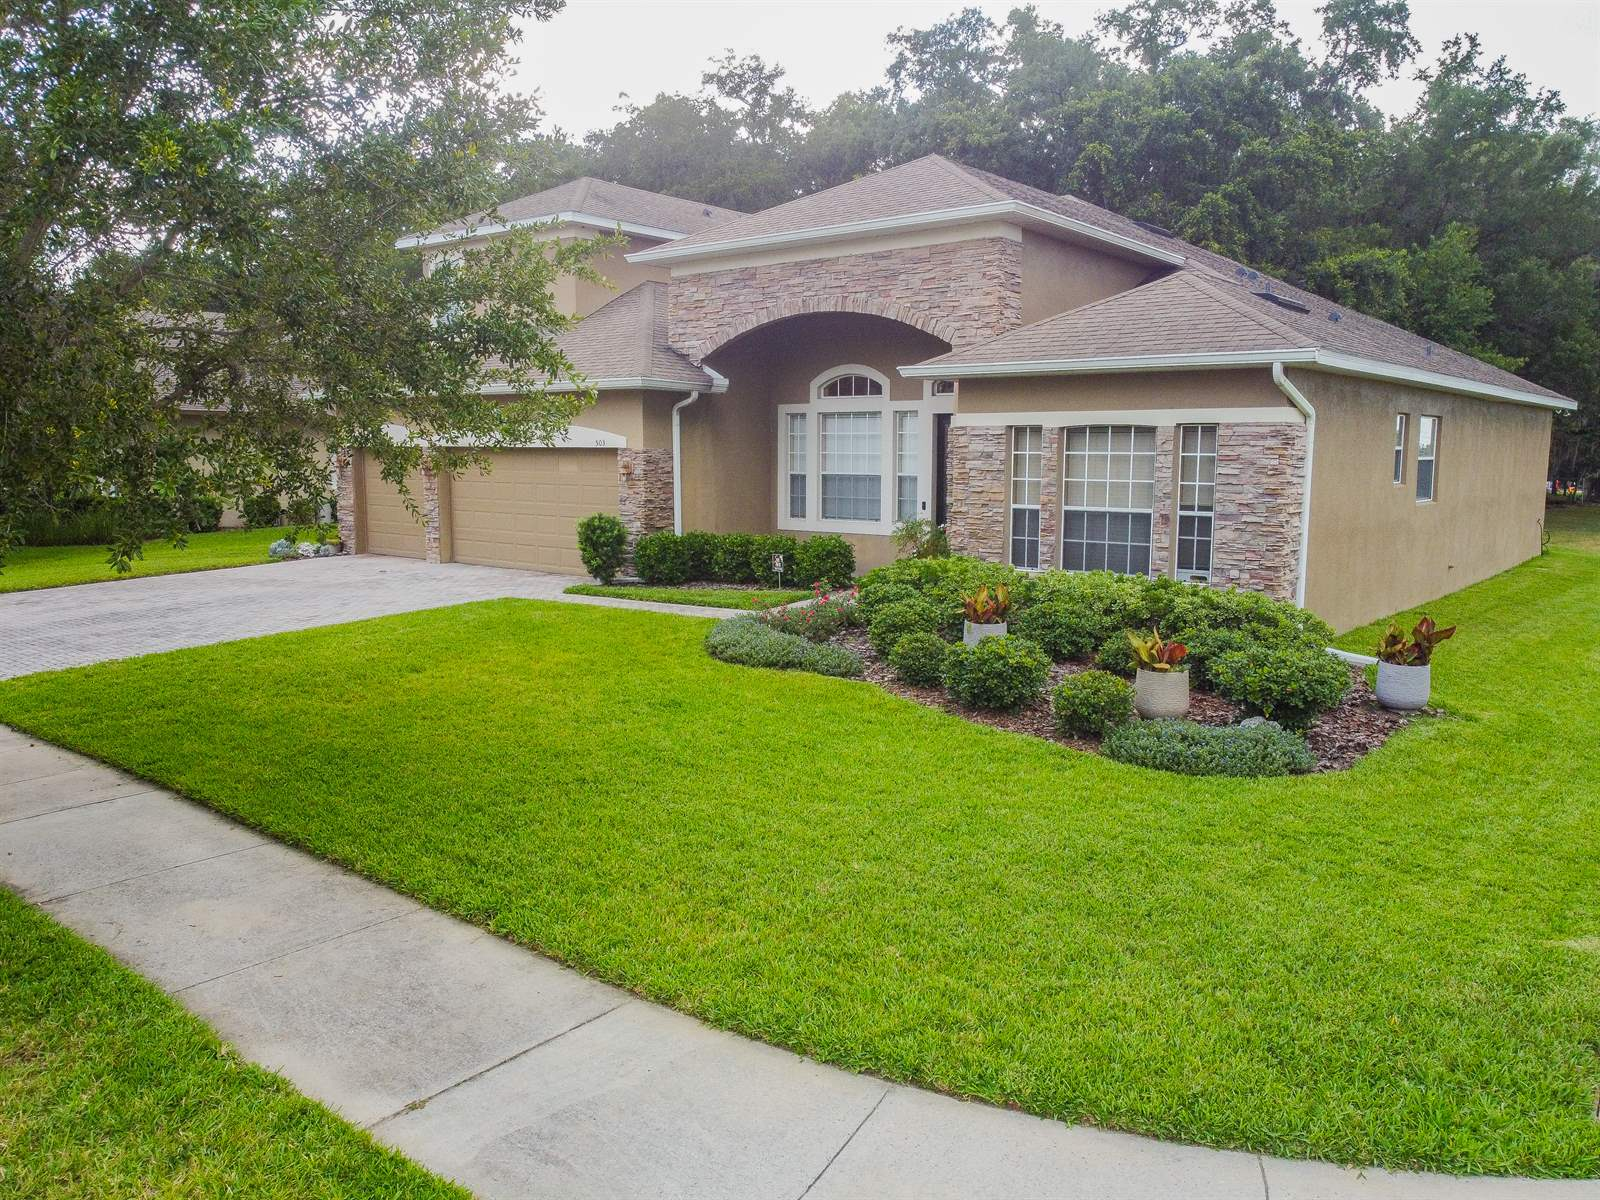 503 Courtlea Cove Ave, Winter Garden, FL 34787